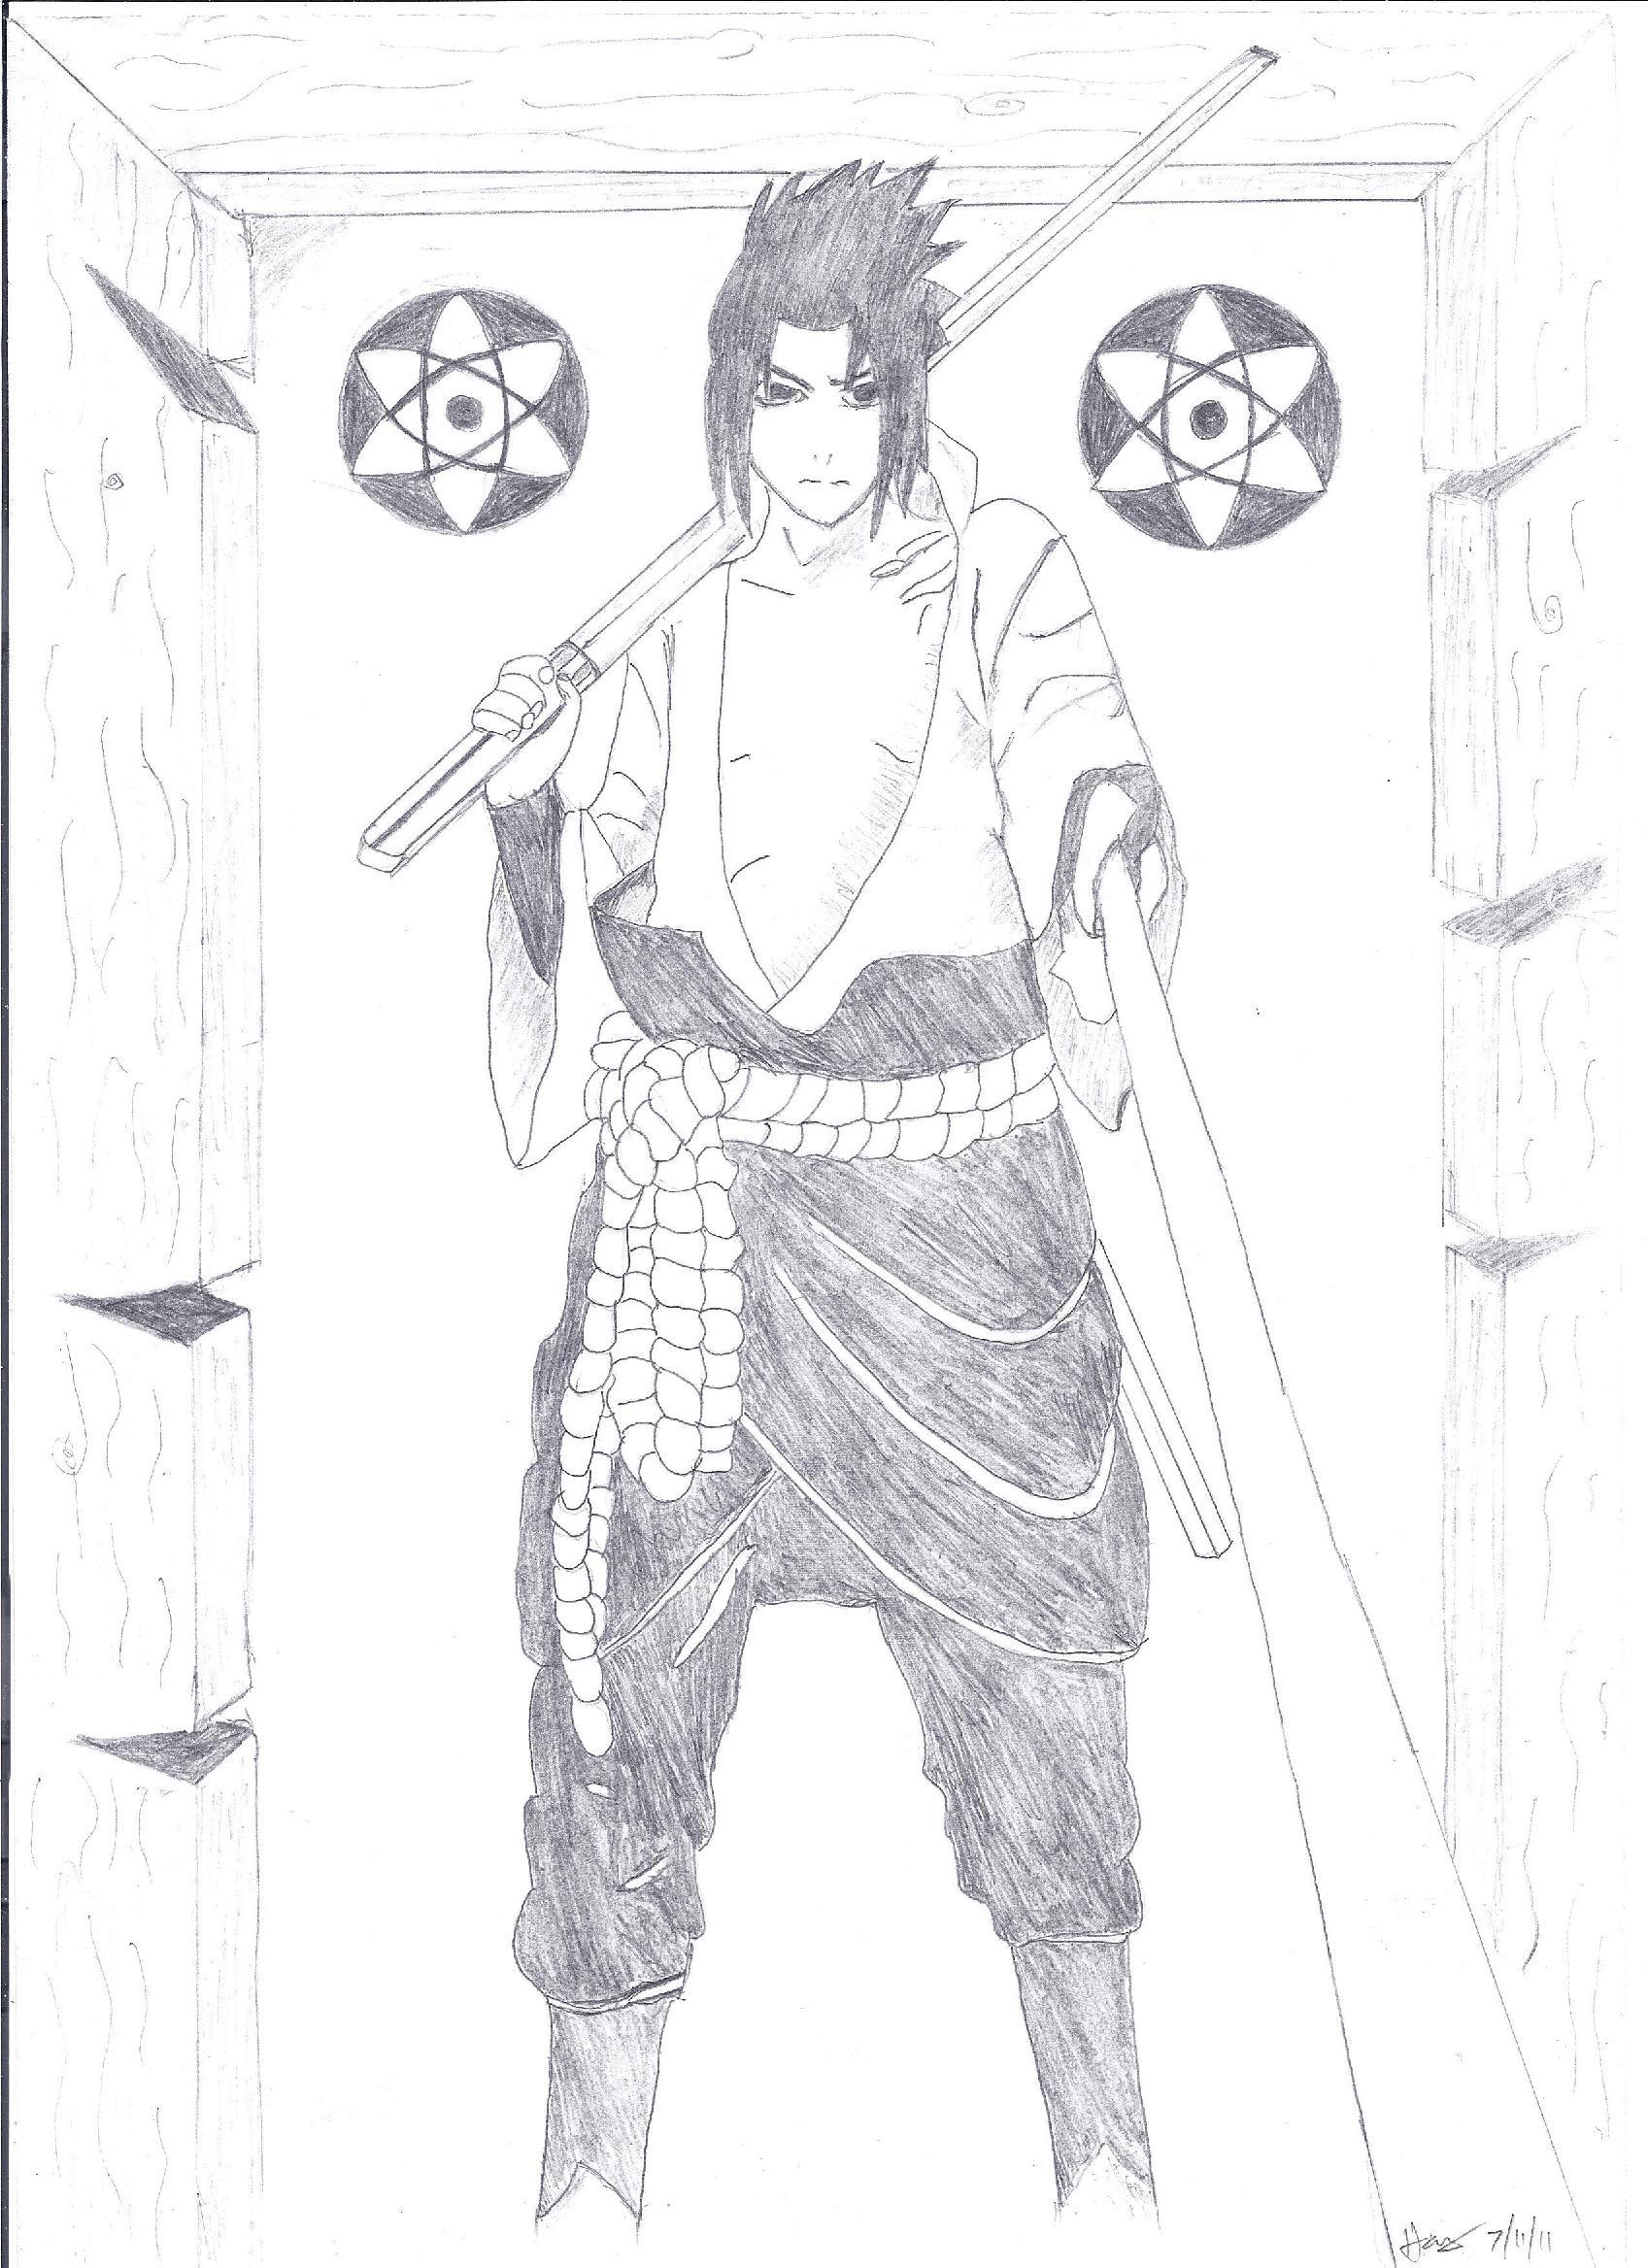 Sasuke by hahaha37 on deviantart